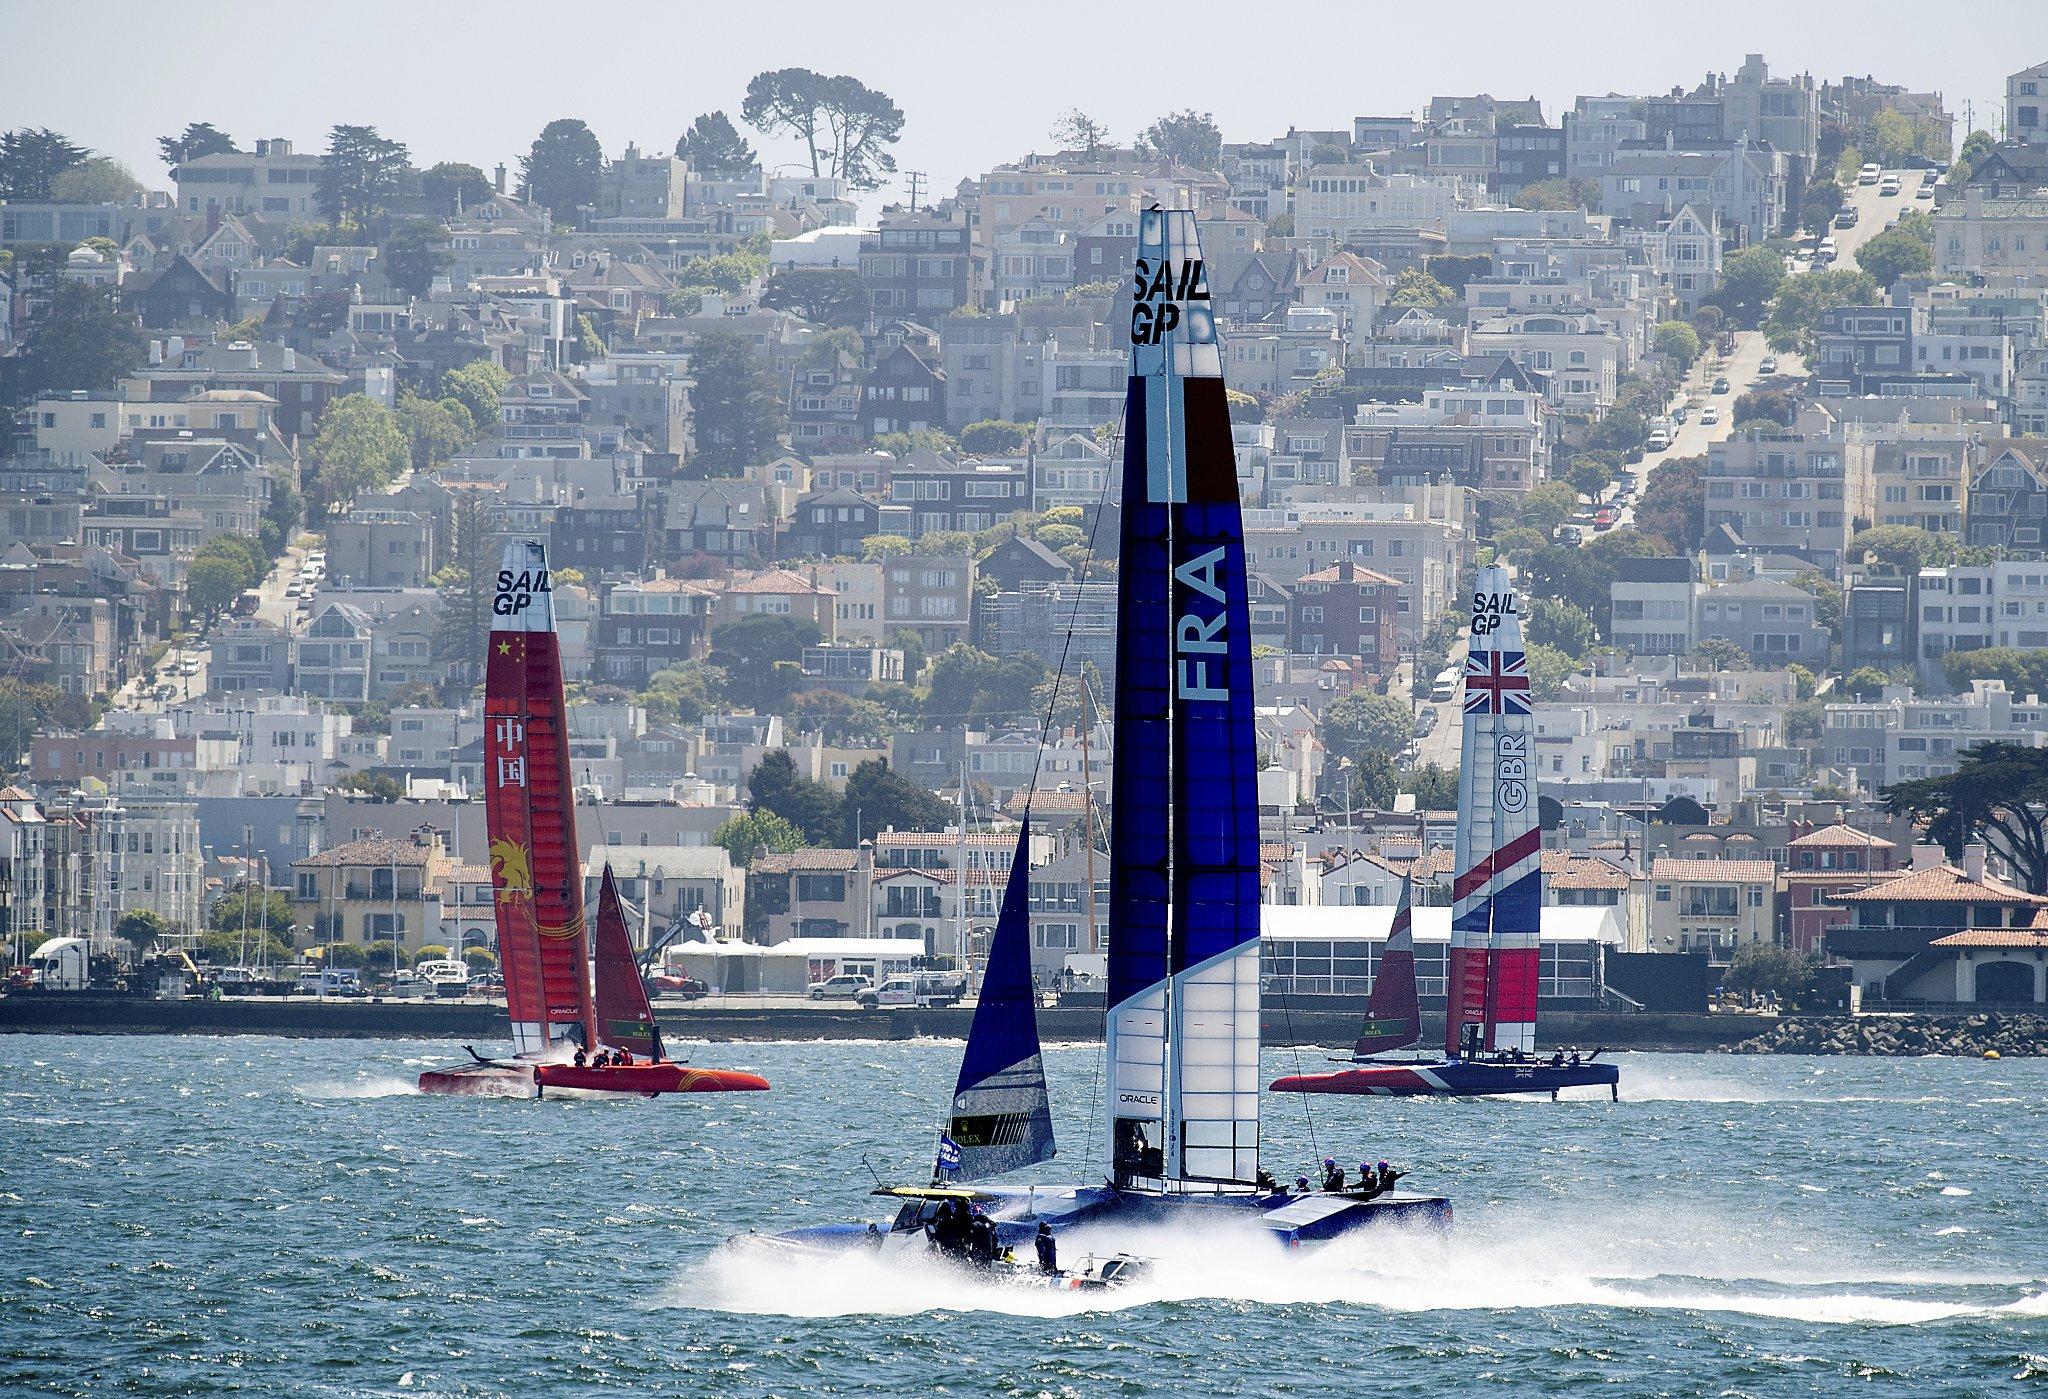 SailGP brings the world's fastest sailboats to the bay